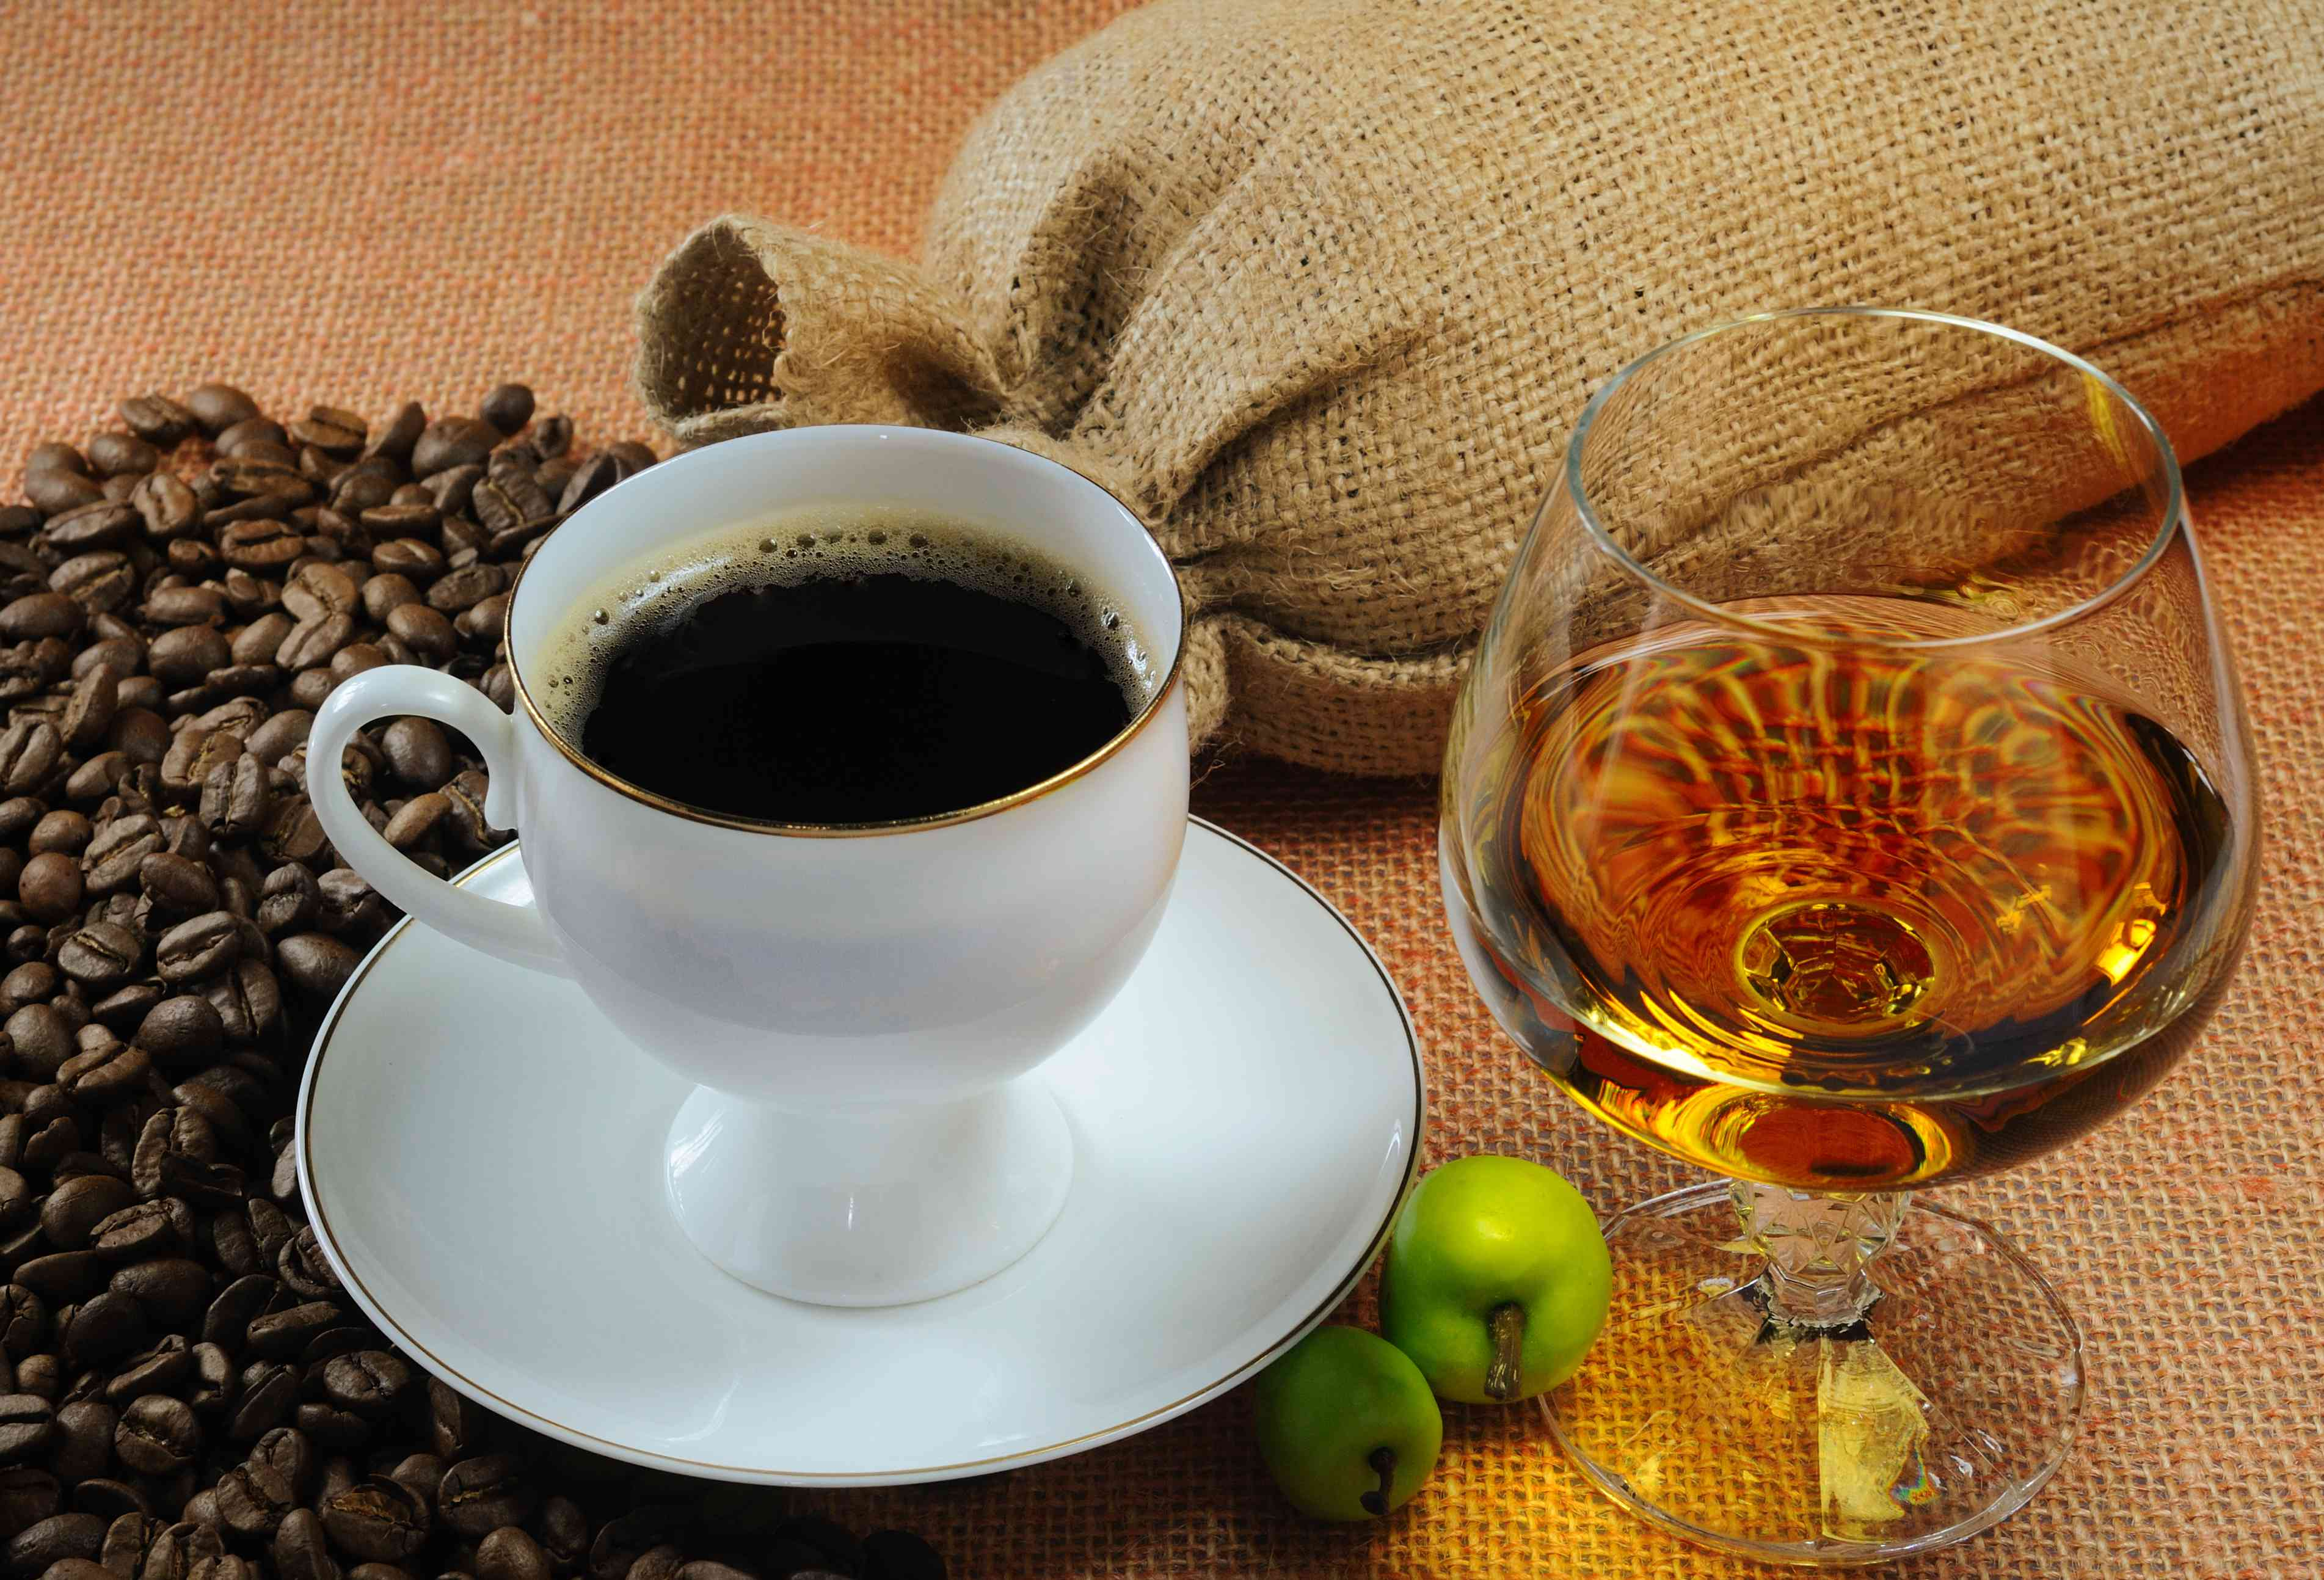 Brandy and Coffee